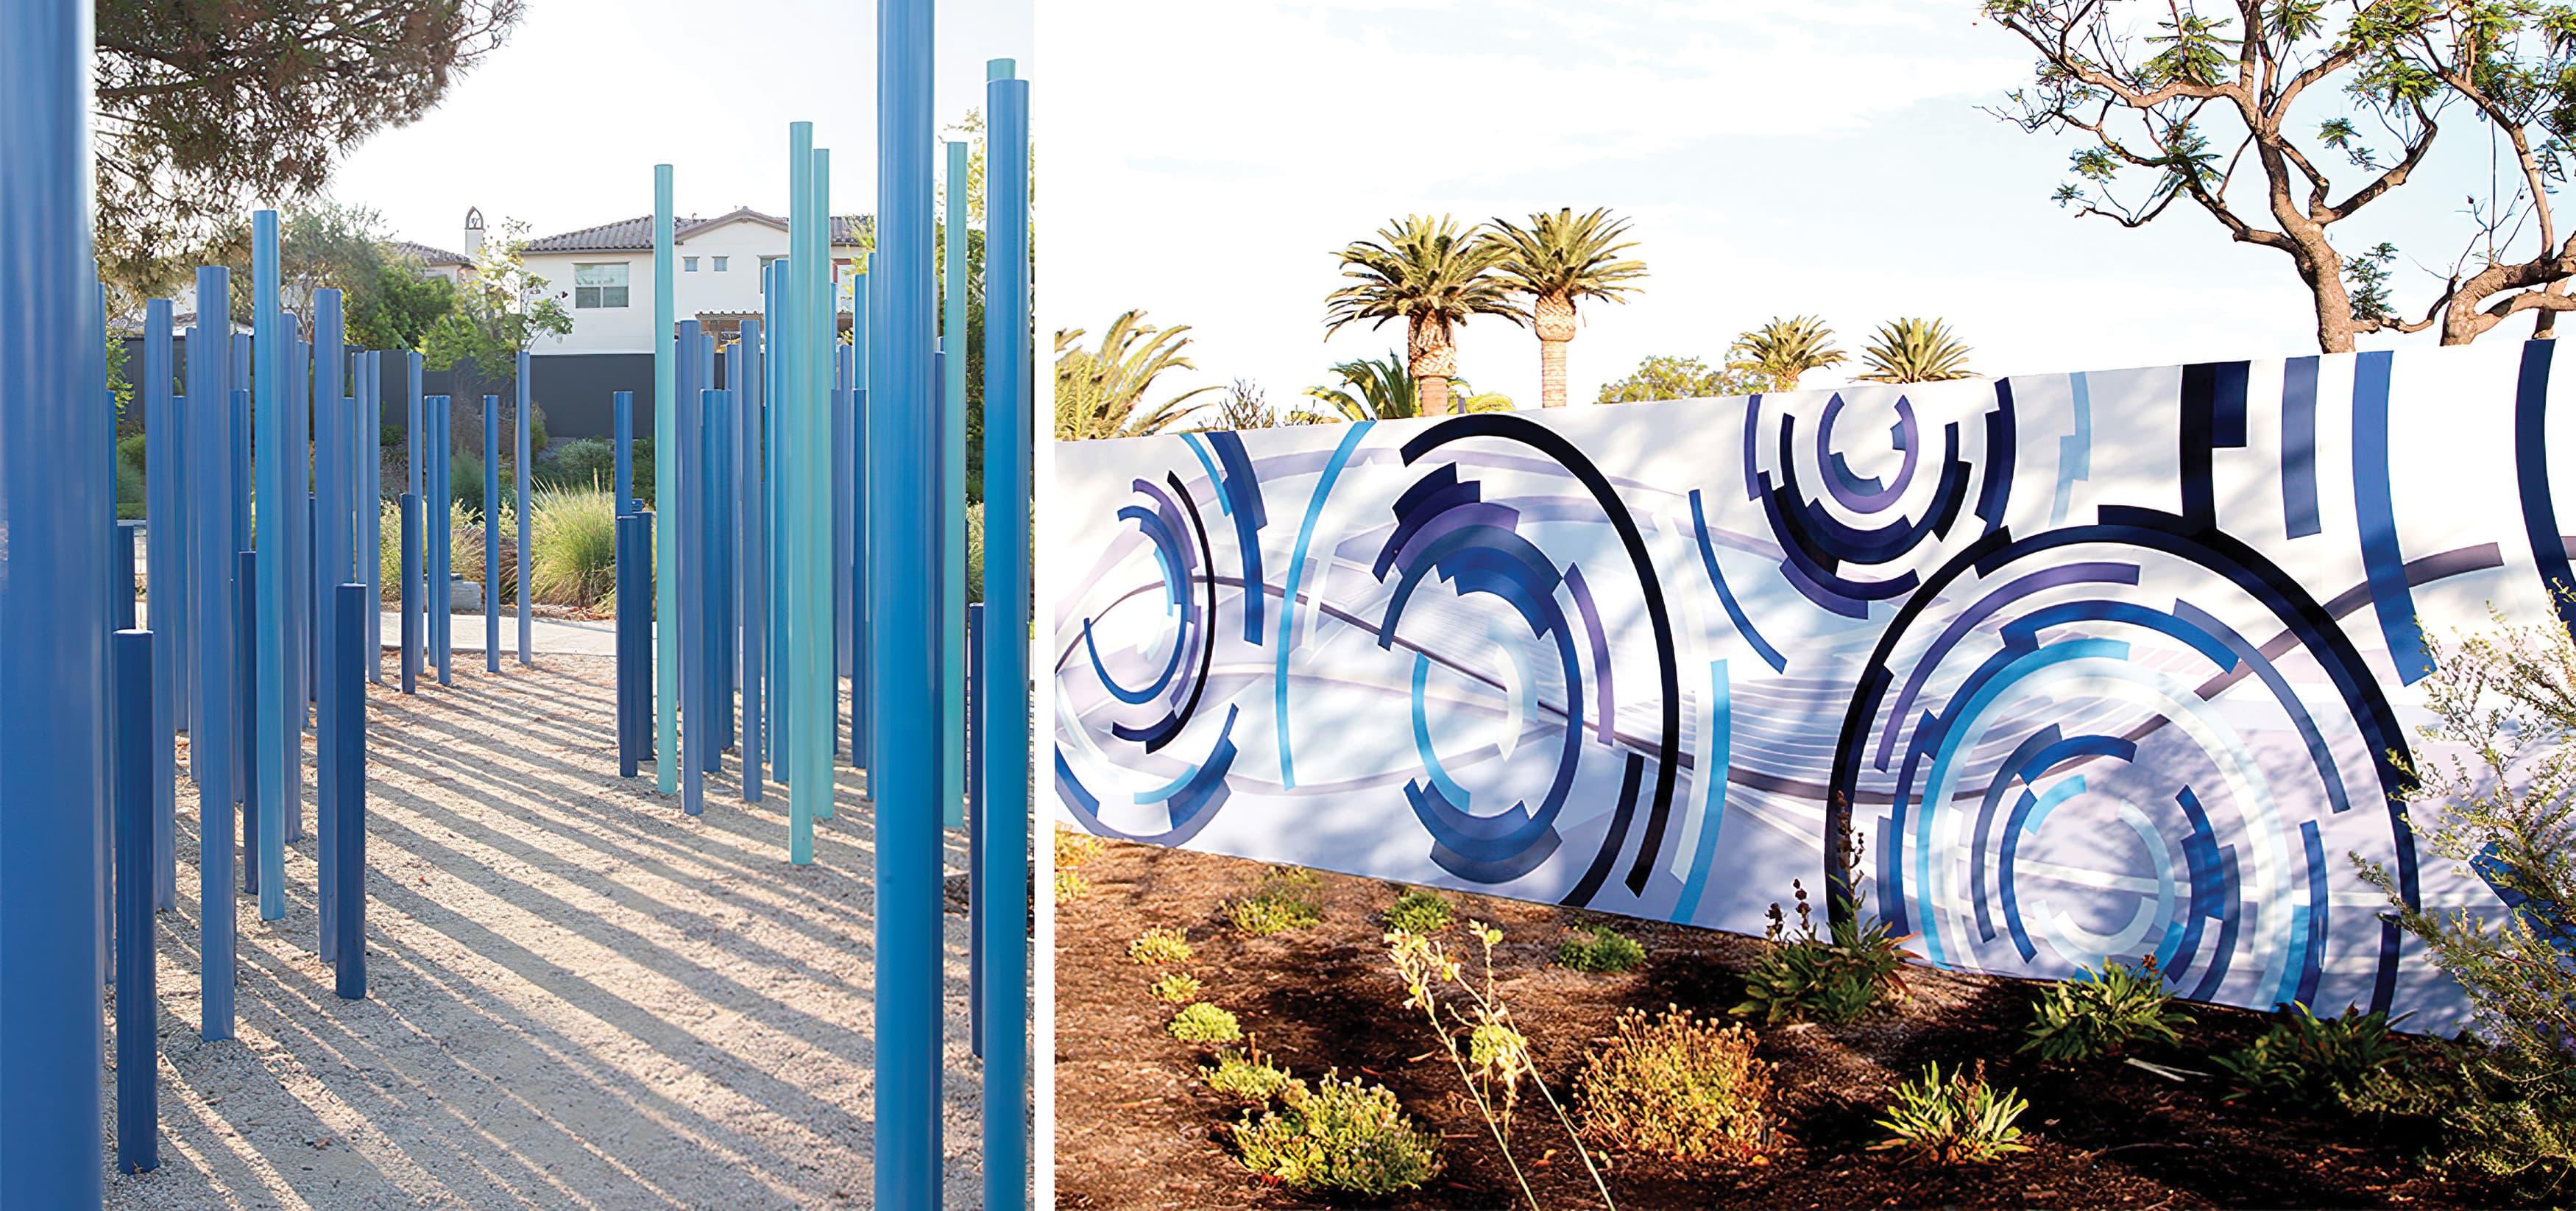 The Pools, a residential community park in Irvine, California. RSM Design prepared identity signage and regulatory signage. Sculptural Design. Park Design. Mural Design. Public Art.